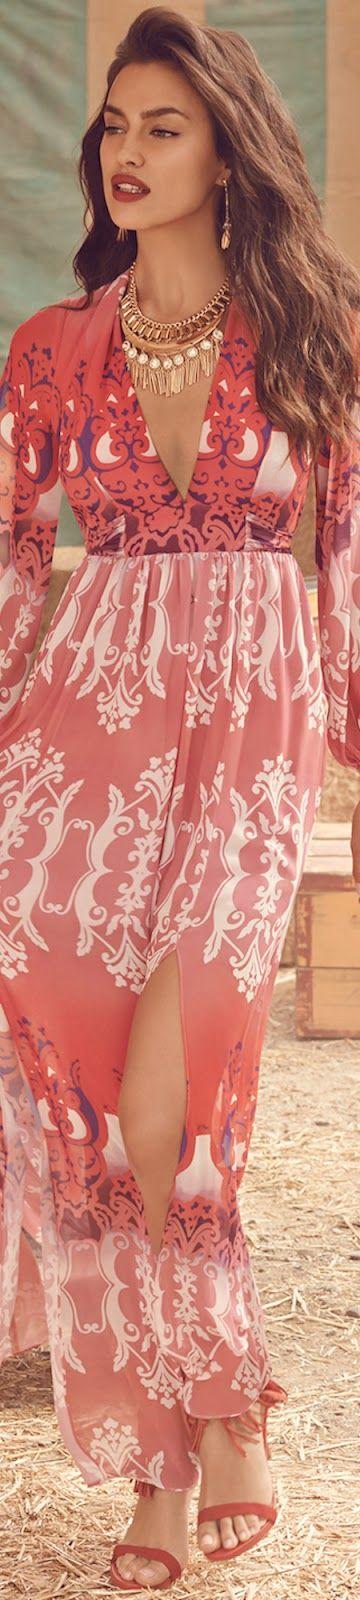 BEBE Summer 2015 women fashion clothing style apparel @RORESS closet ideas